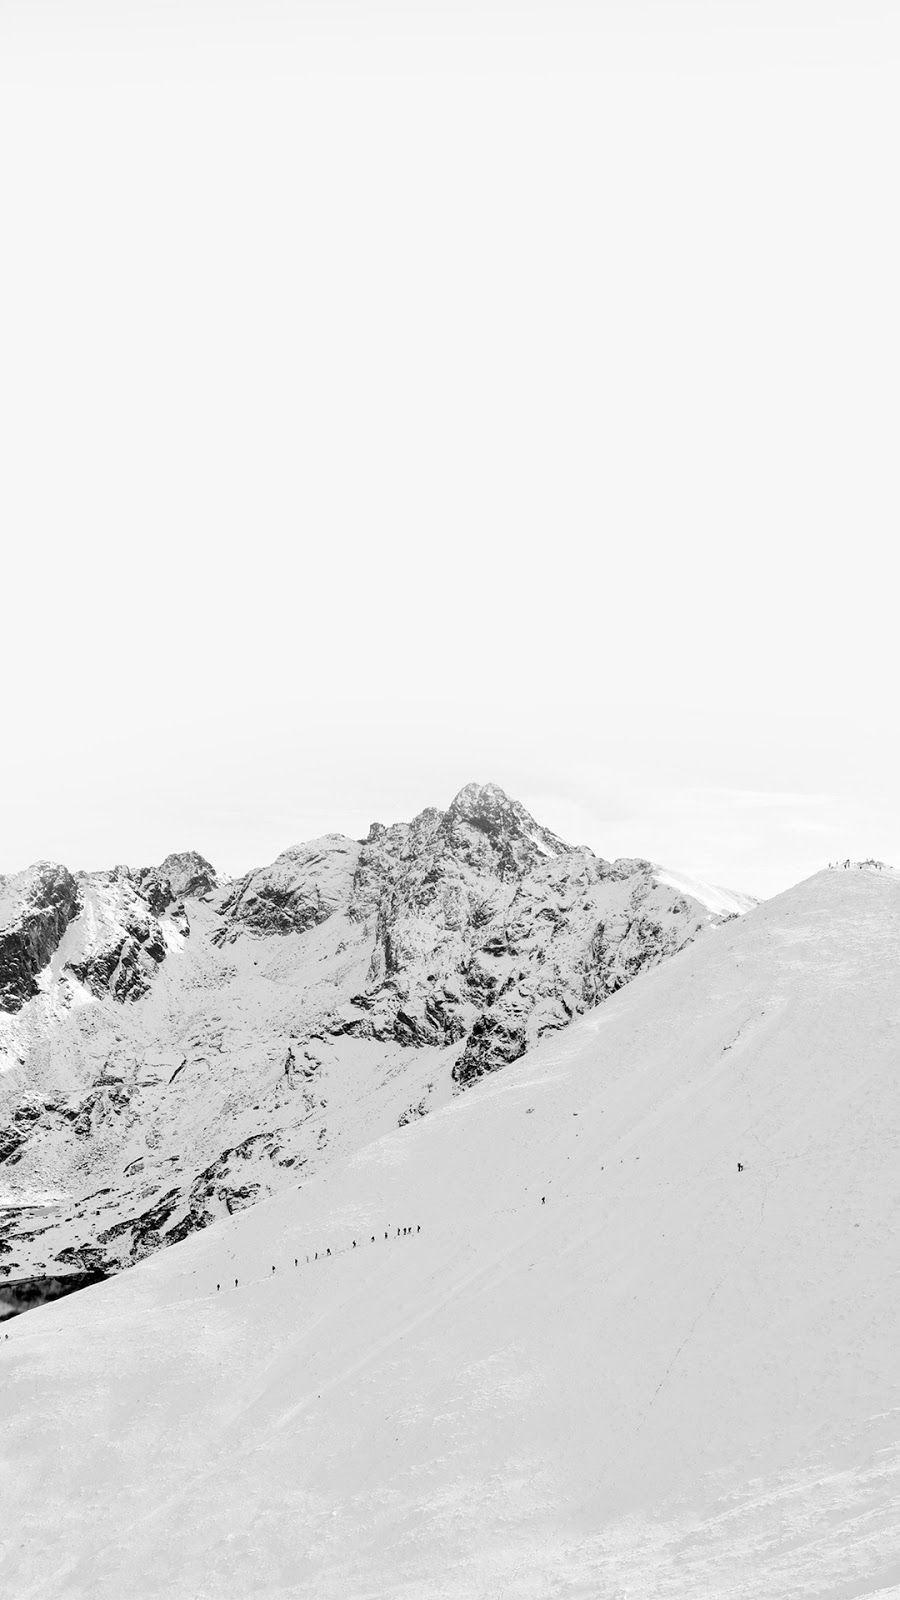 Awesome Fond D Ecran Iphone Hd 7 618 Snow Wallpaper Iphone White Wallpaper For Iphone Iphone 5s Wallpaper